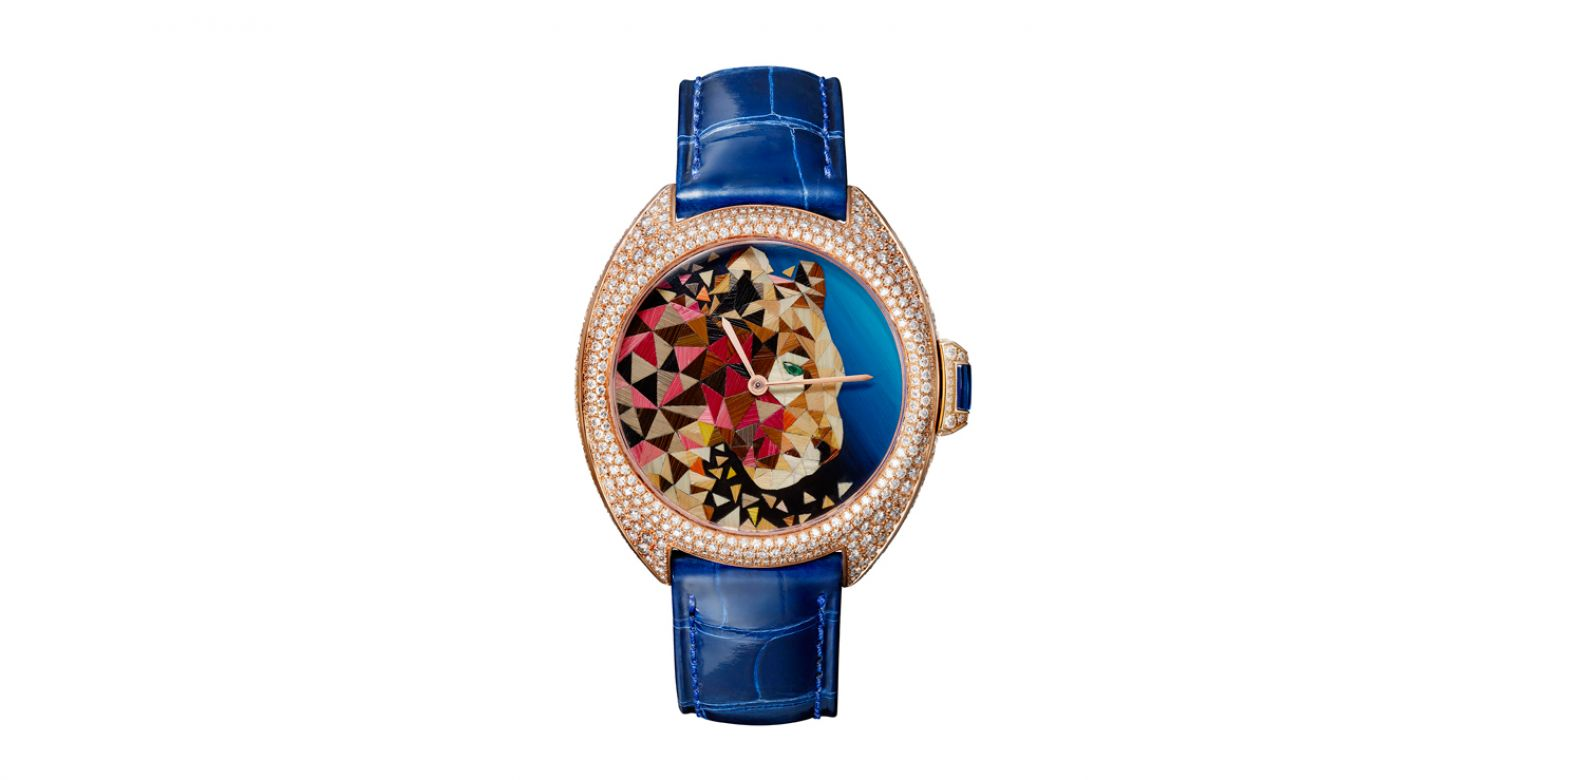 Clé de Cartier 美洲豹秸稈鑲嵌腕錶。(圖片提供/Cartier)